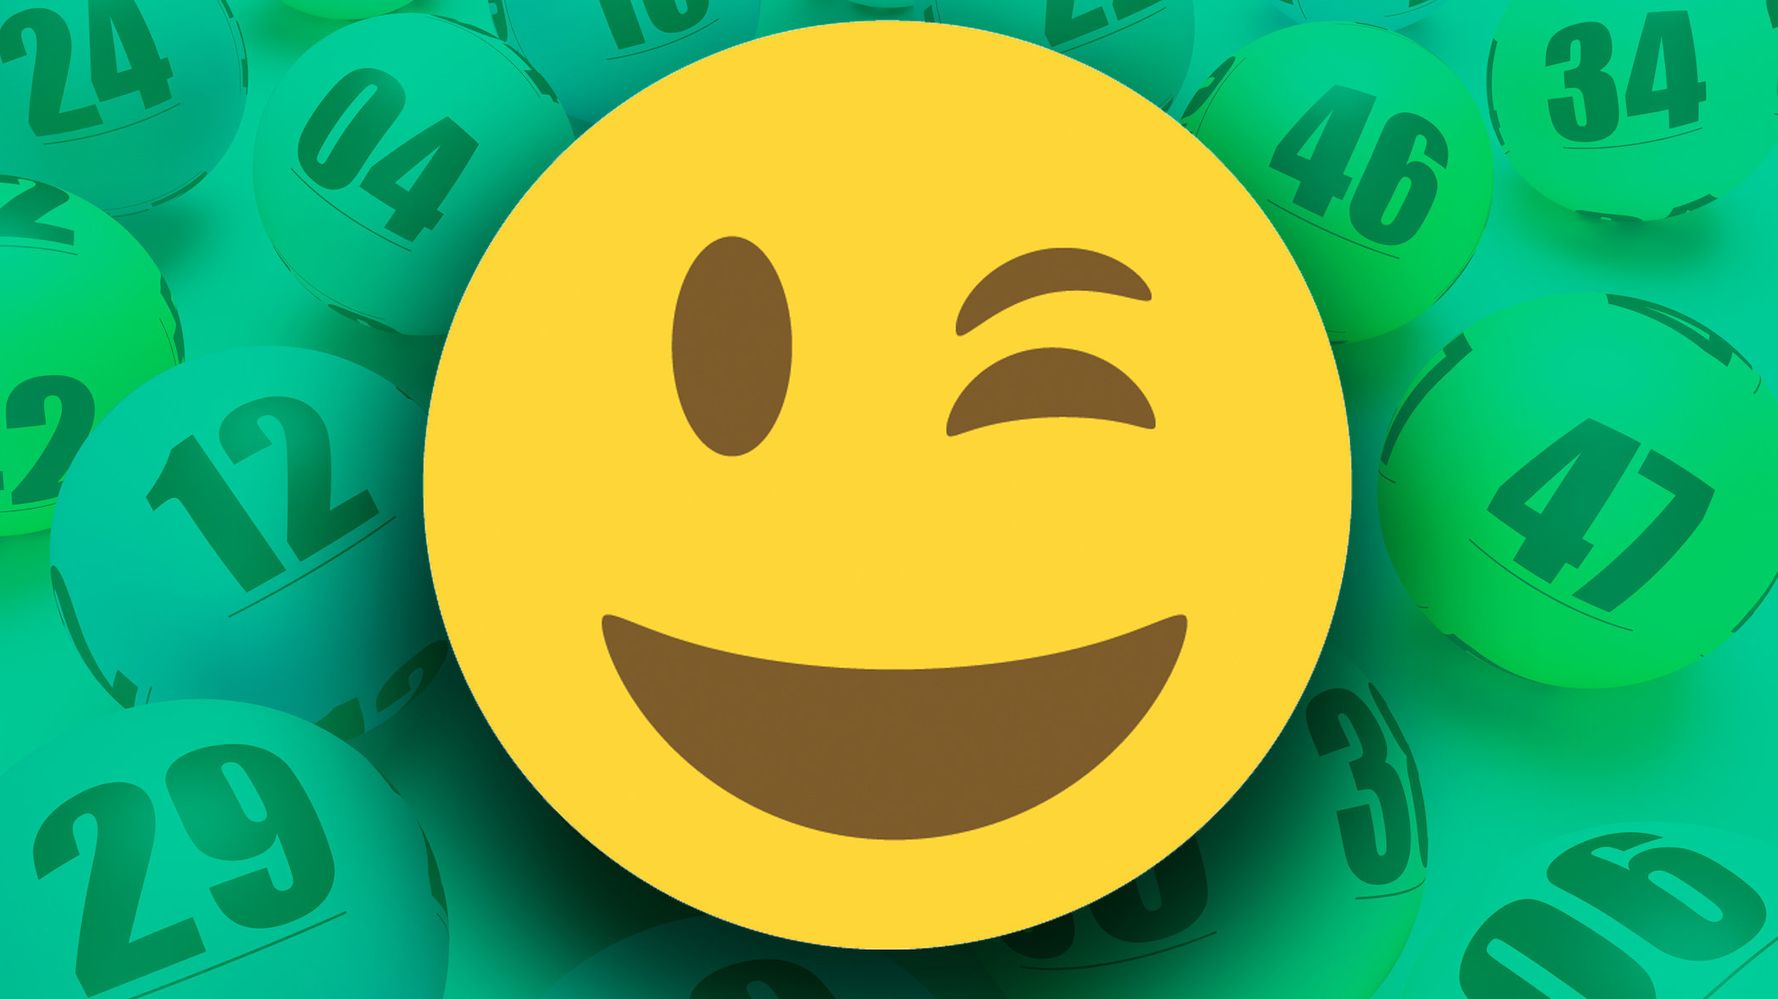 Lottery Winner Picks Up Check In Emoji Wink Mask | HuffPost